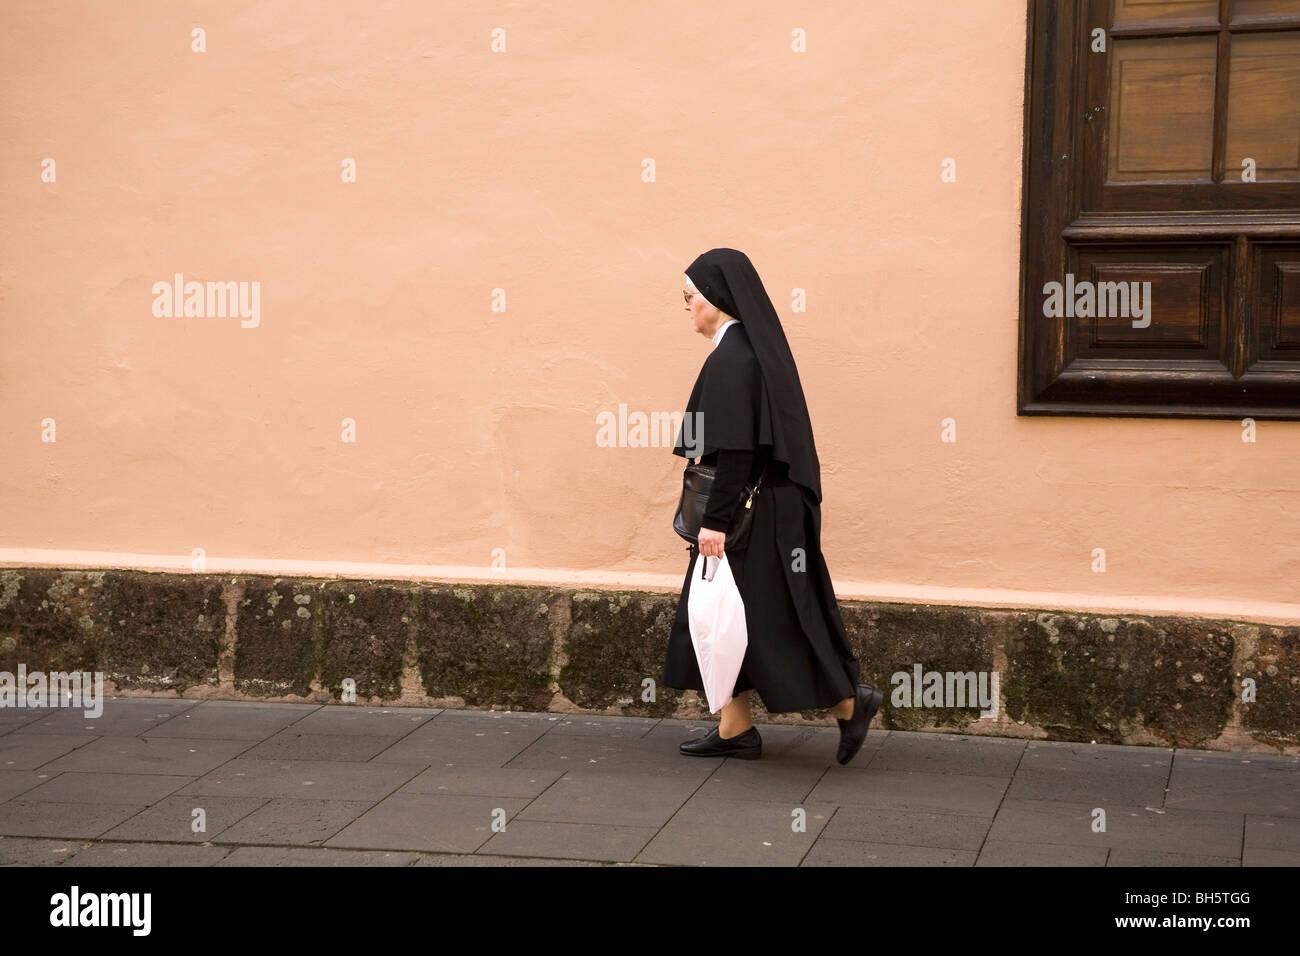 A nun walks along a street in San Cristóbal de La Laguna in Tenerife, Spain. - Stock Image